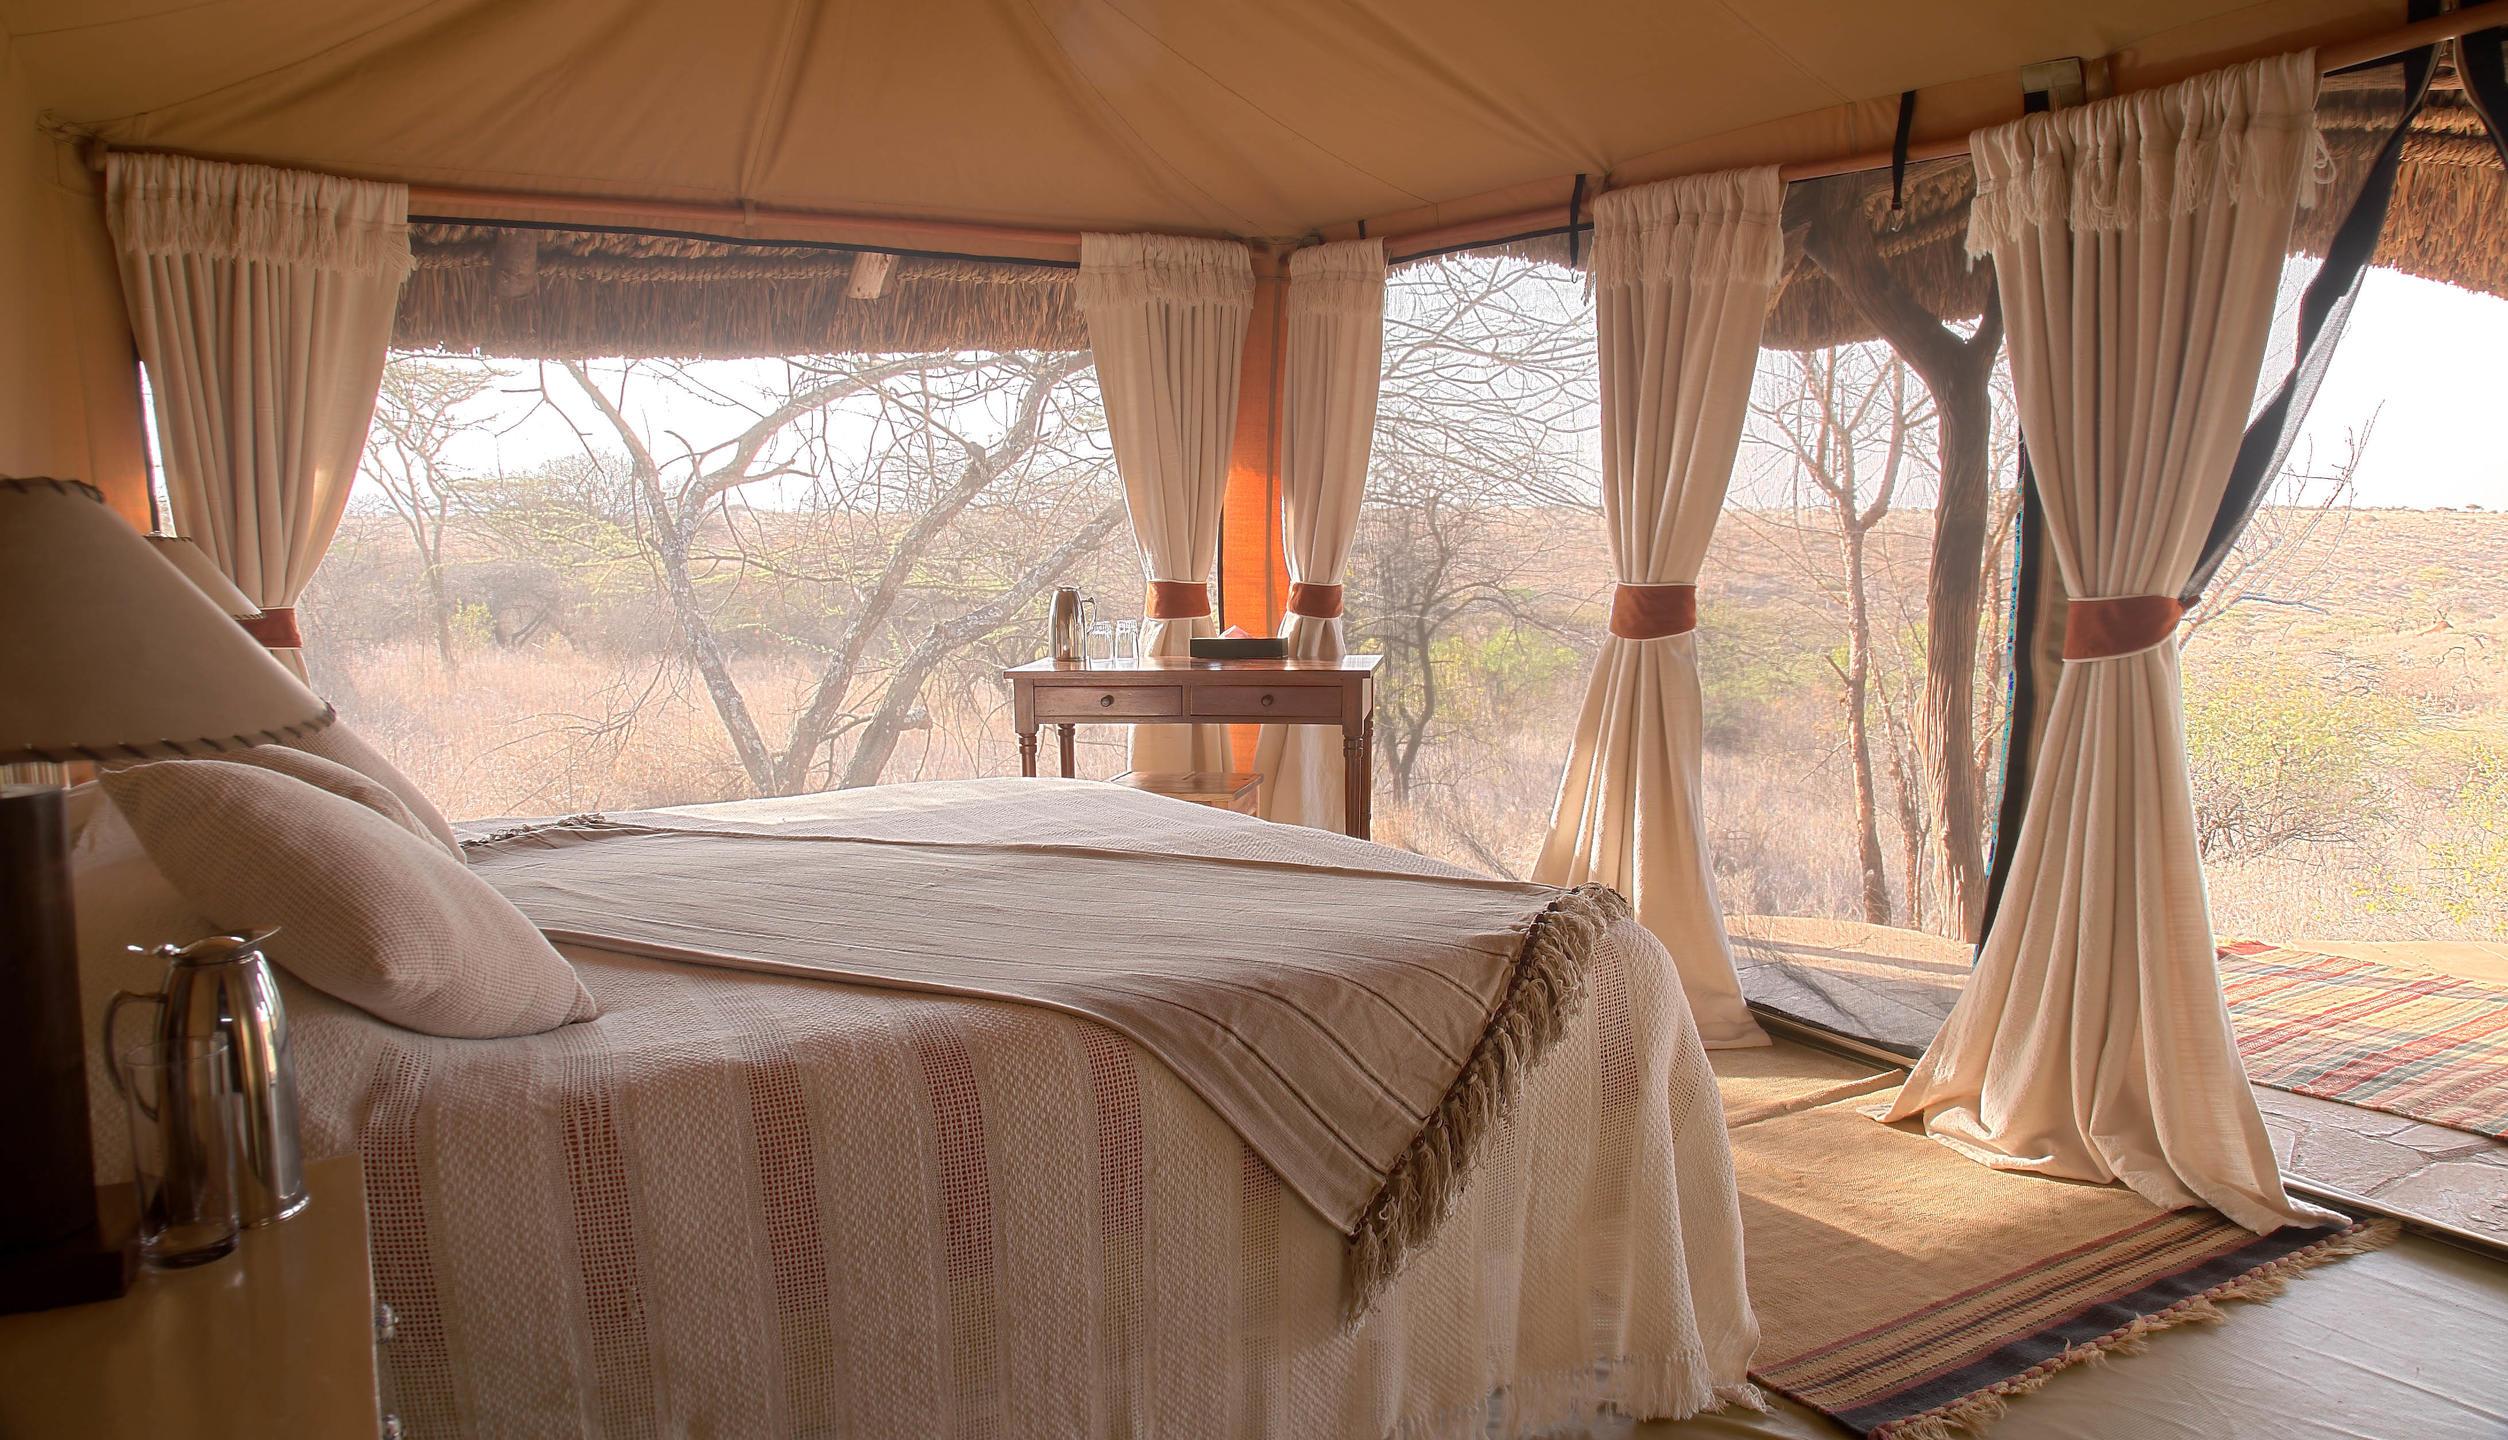 Luxury Safari Tent Double Room